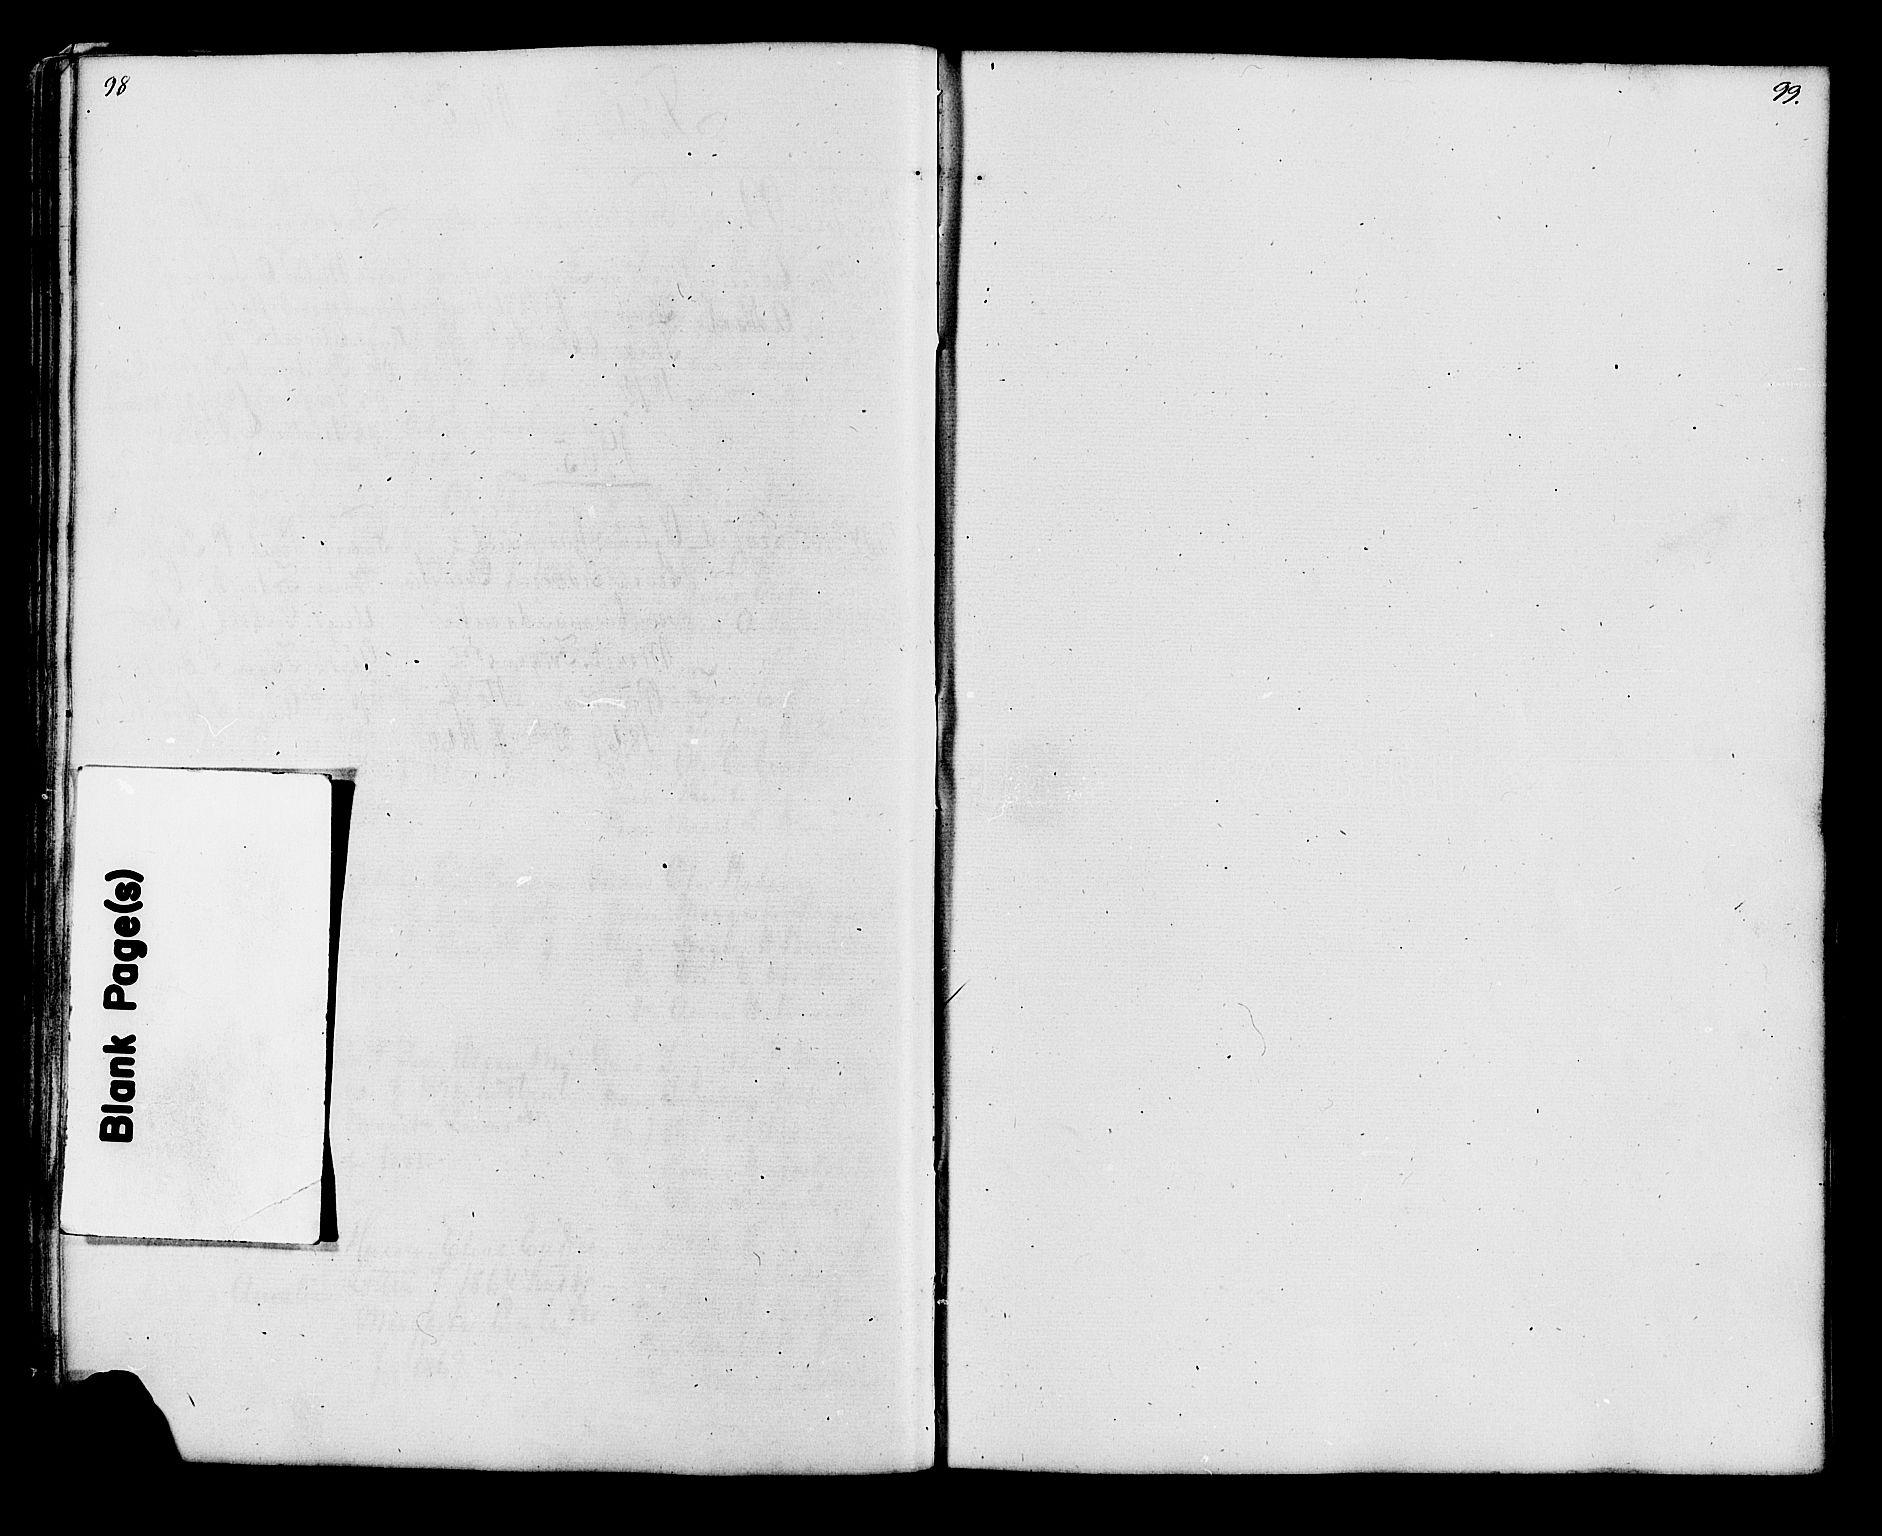 SAH, Lesja prestekontor, Klokkerbok nr. 6, 1871-1904, s. 98-99